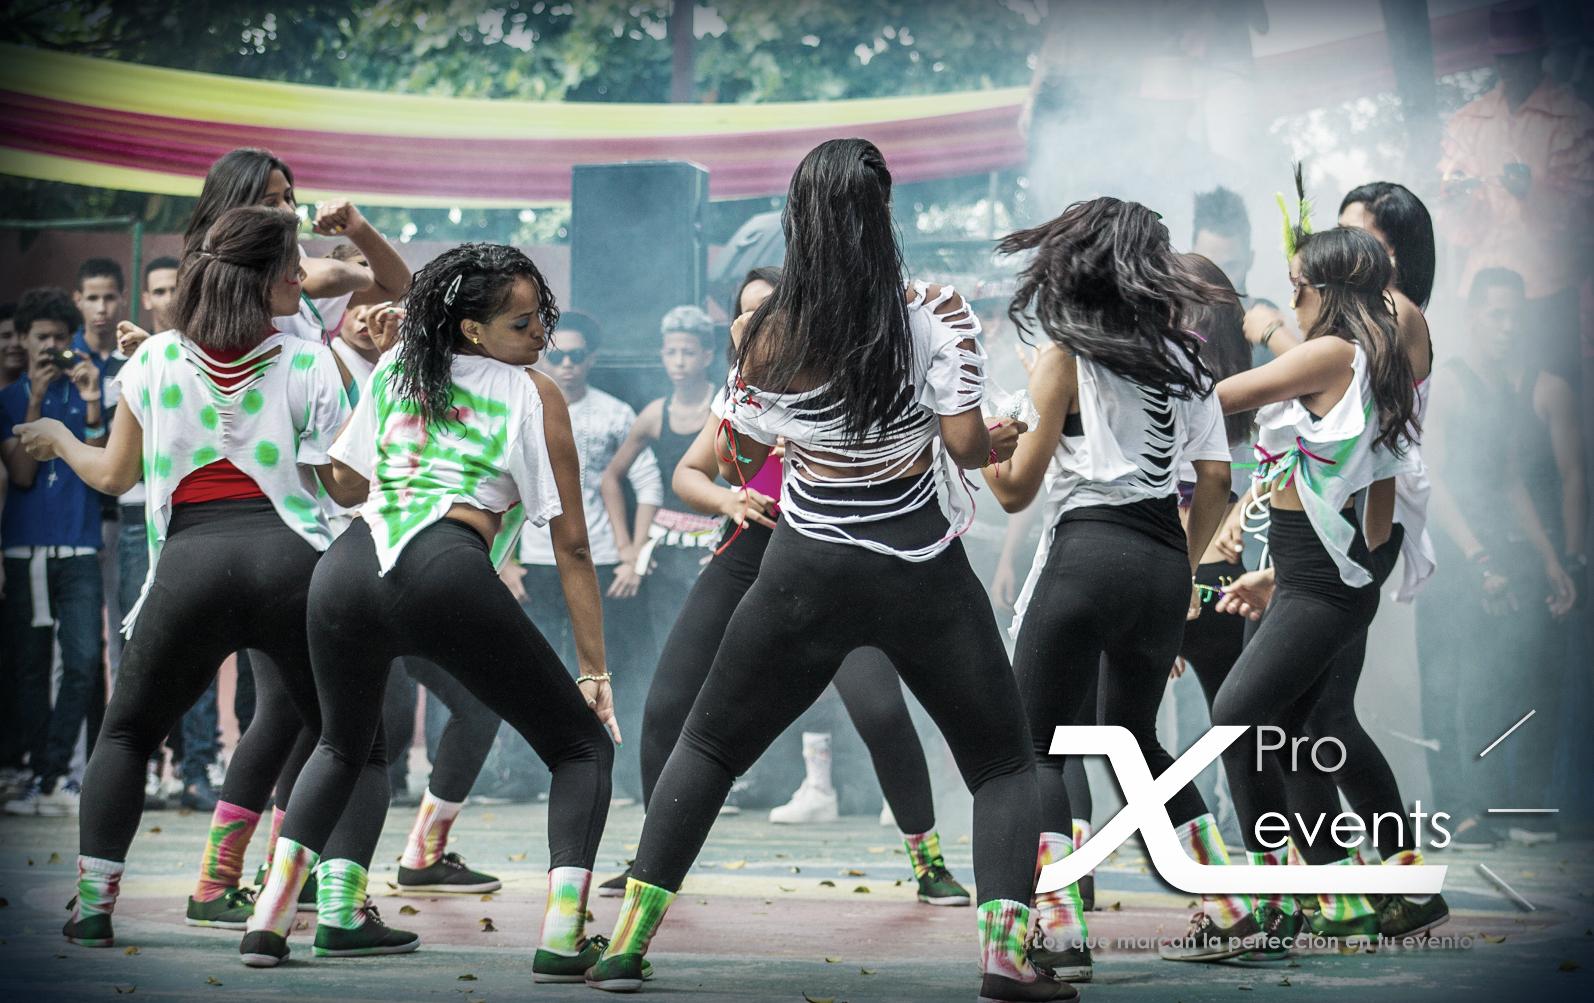 X Pro events  - 809-846-3784 - Disfruta al maximo tu actividad.jpg